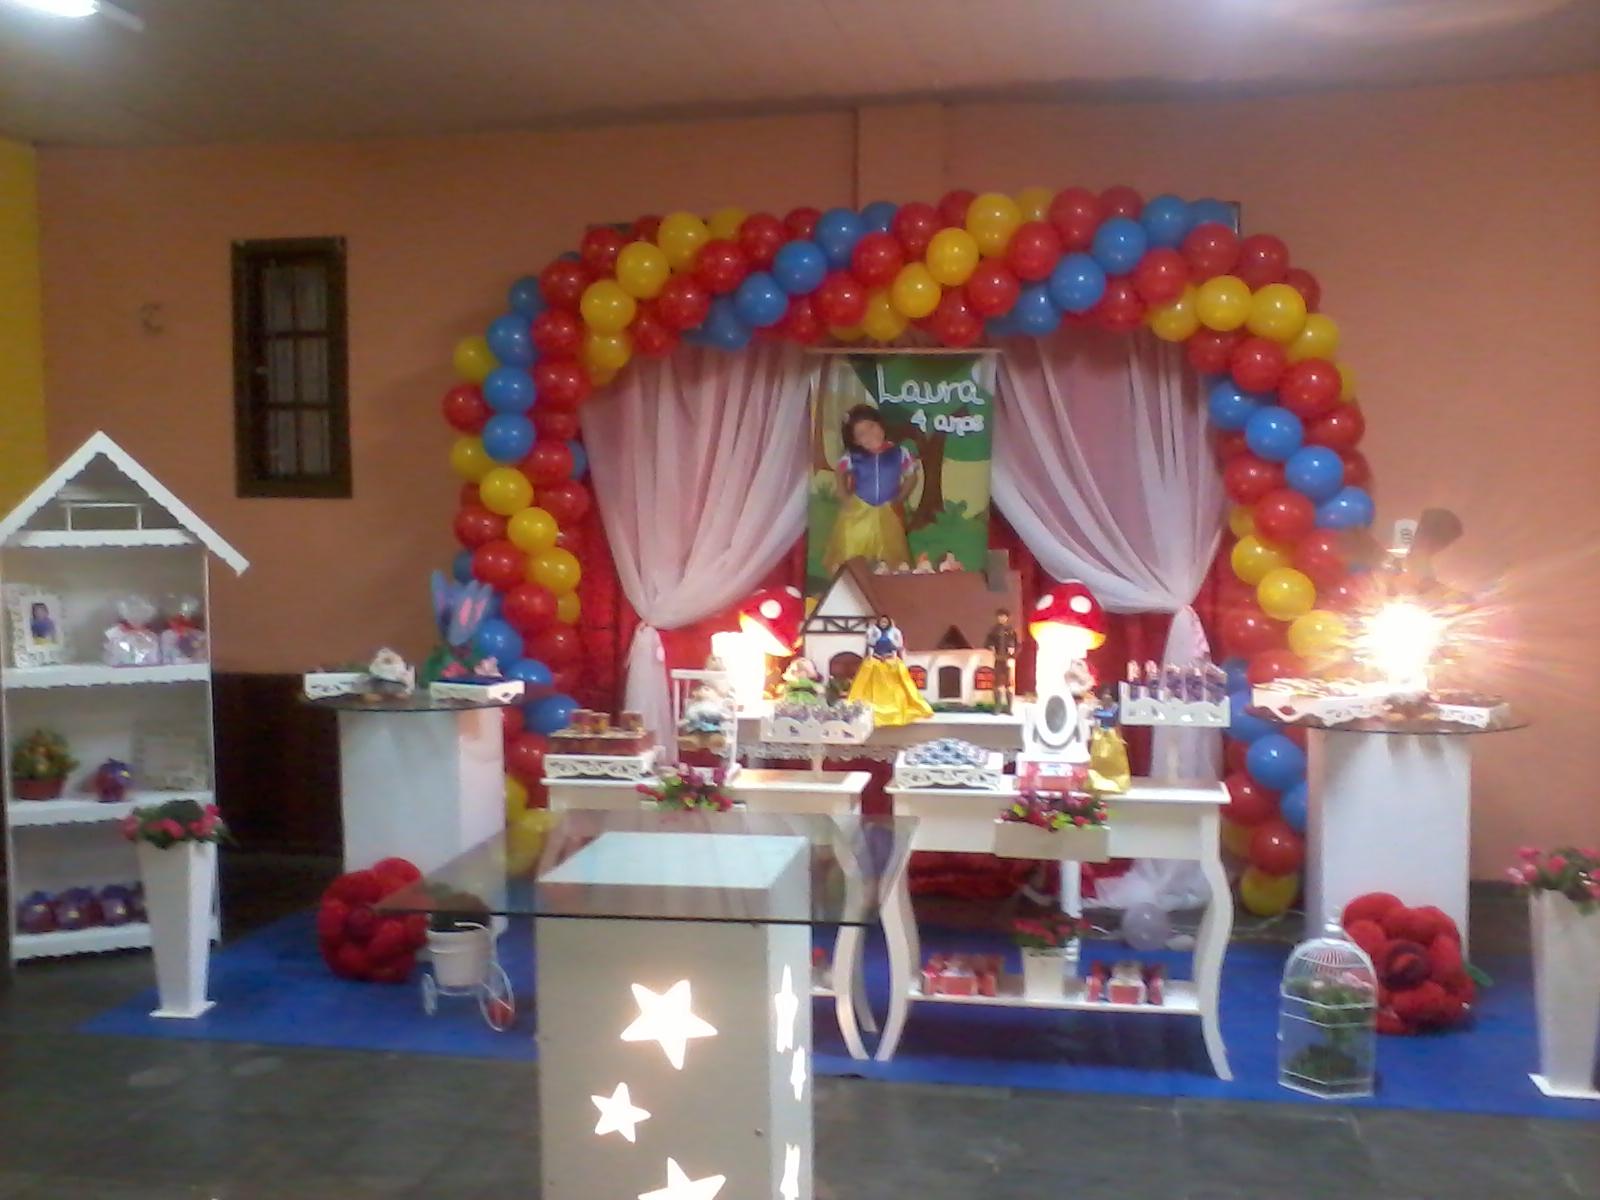 decoracao festa branca de neve provencal:Casa de Festas Sonho de Criança: Branca de Neve Provençal